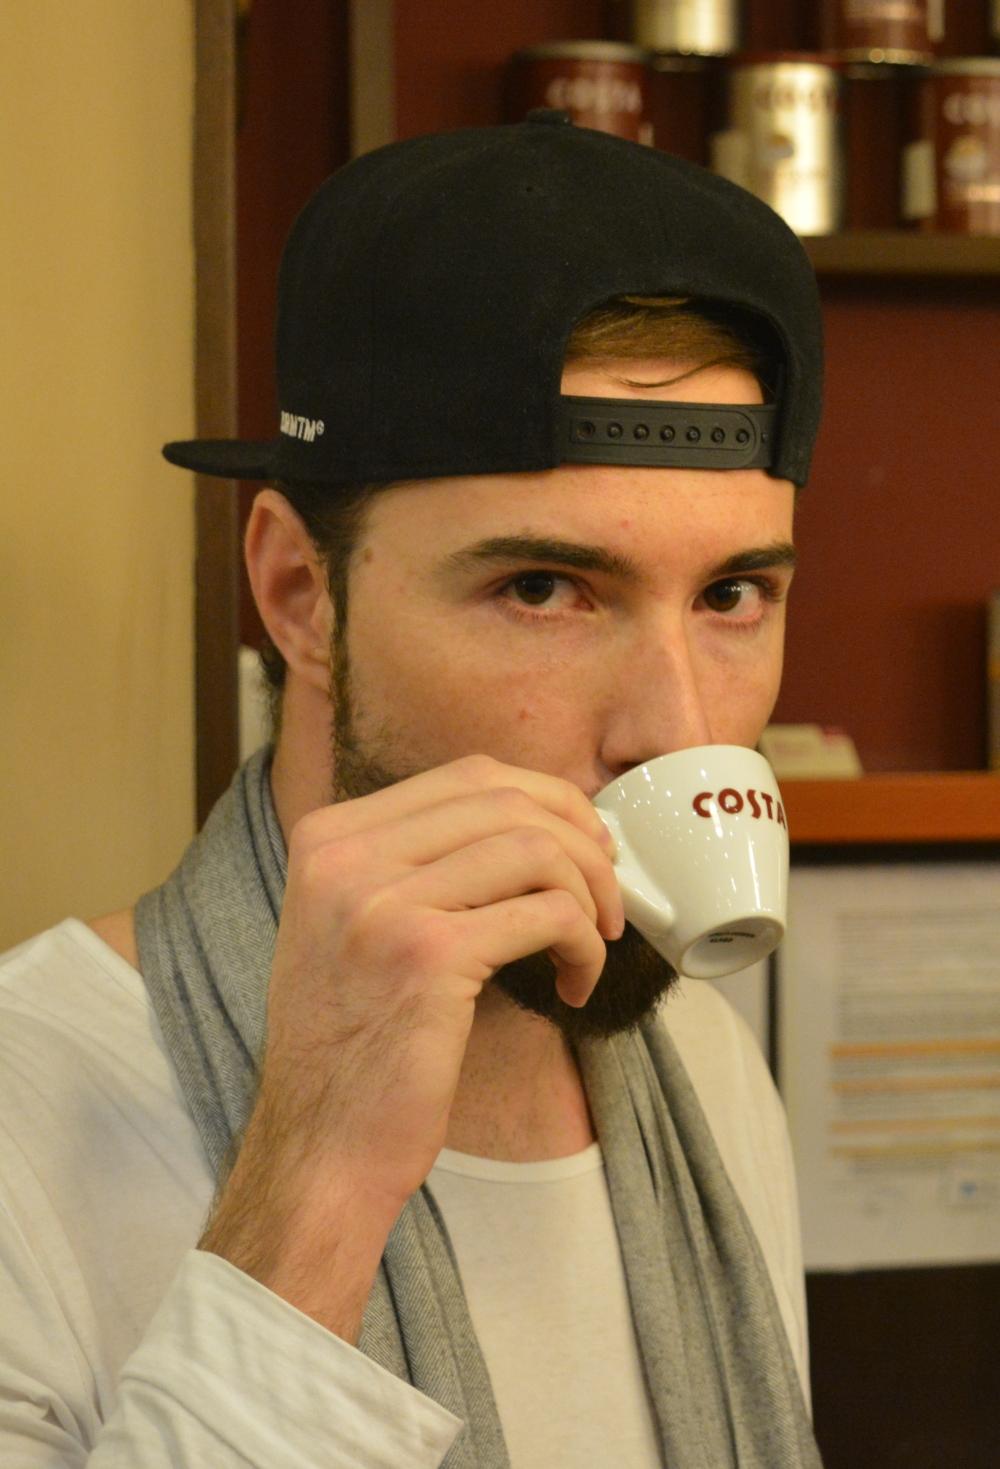 Costa Coffee seminář 027